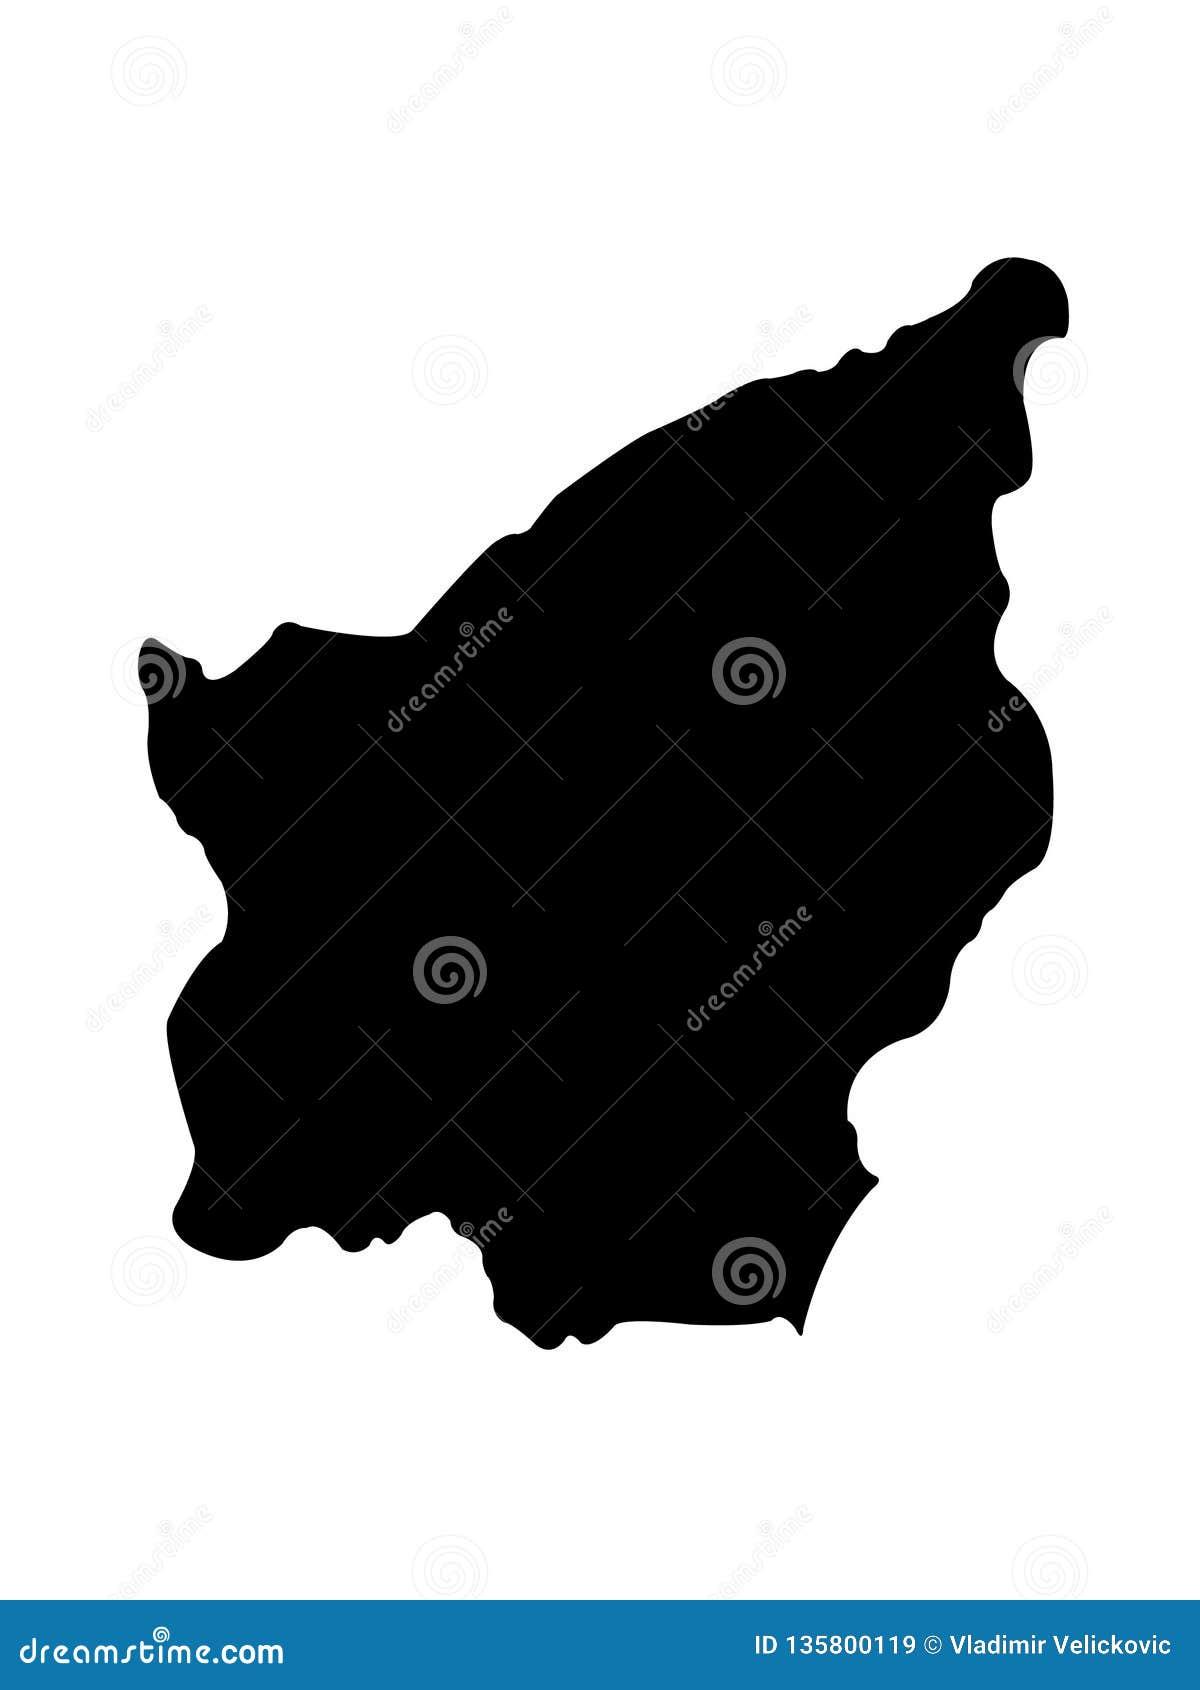 San Marino map - Republic of San Marino